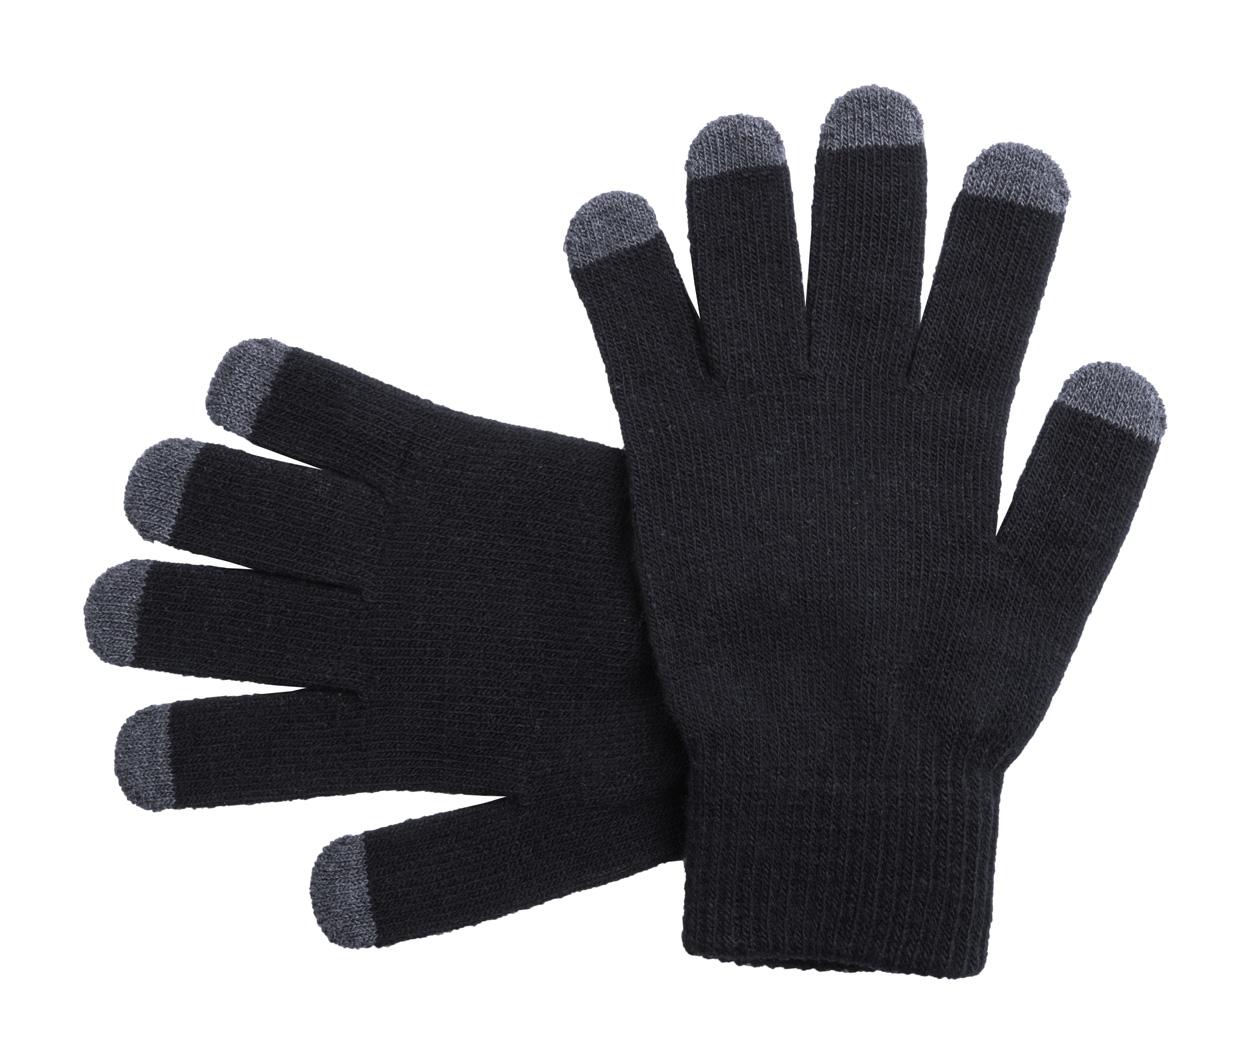 Tellar touch screen gloves